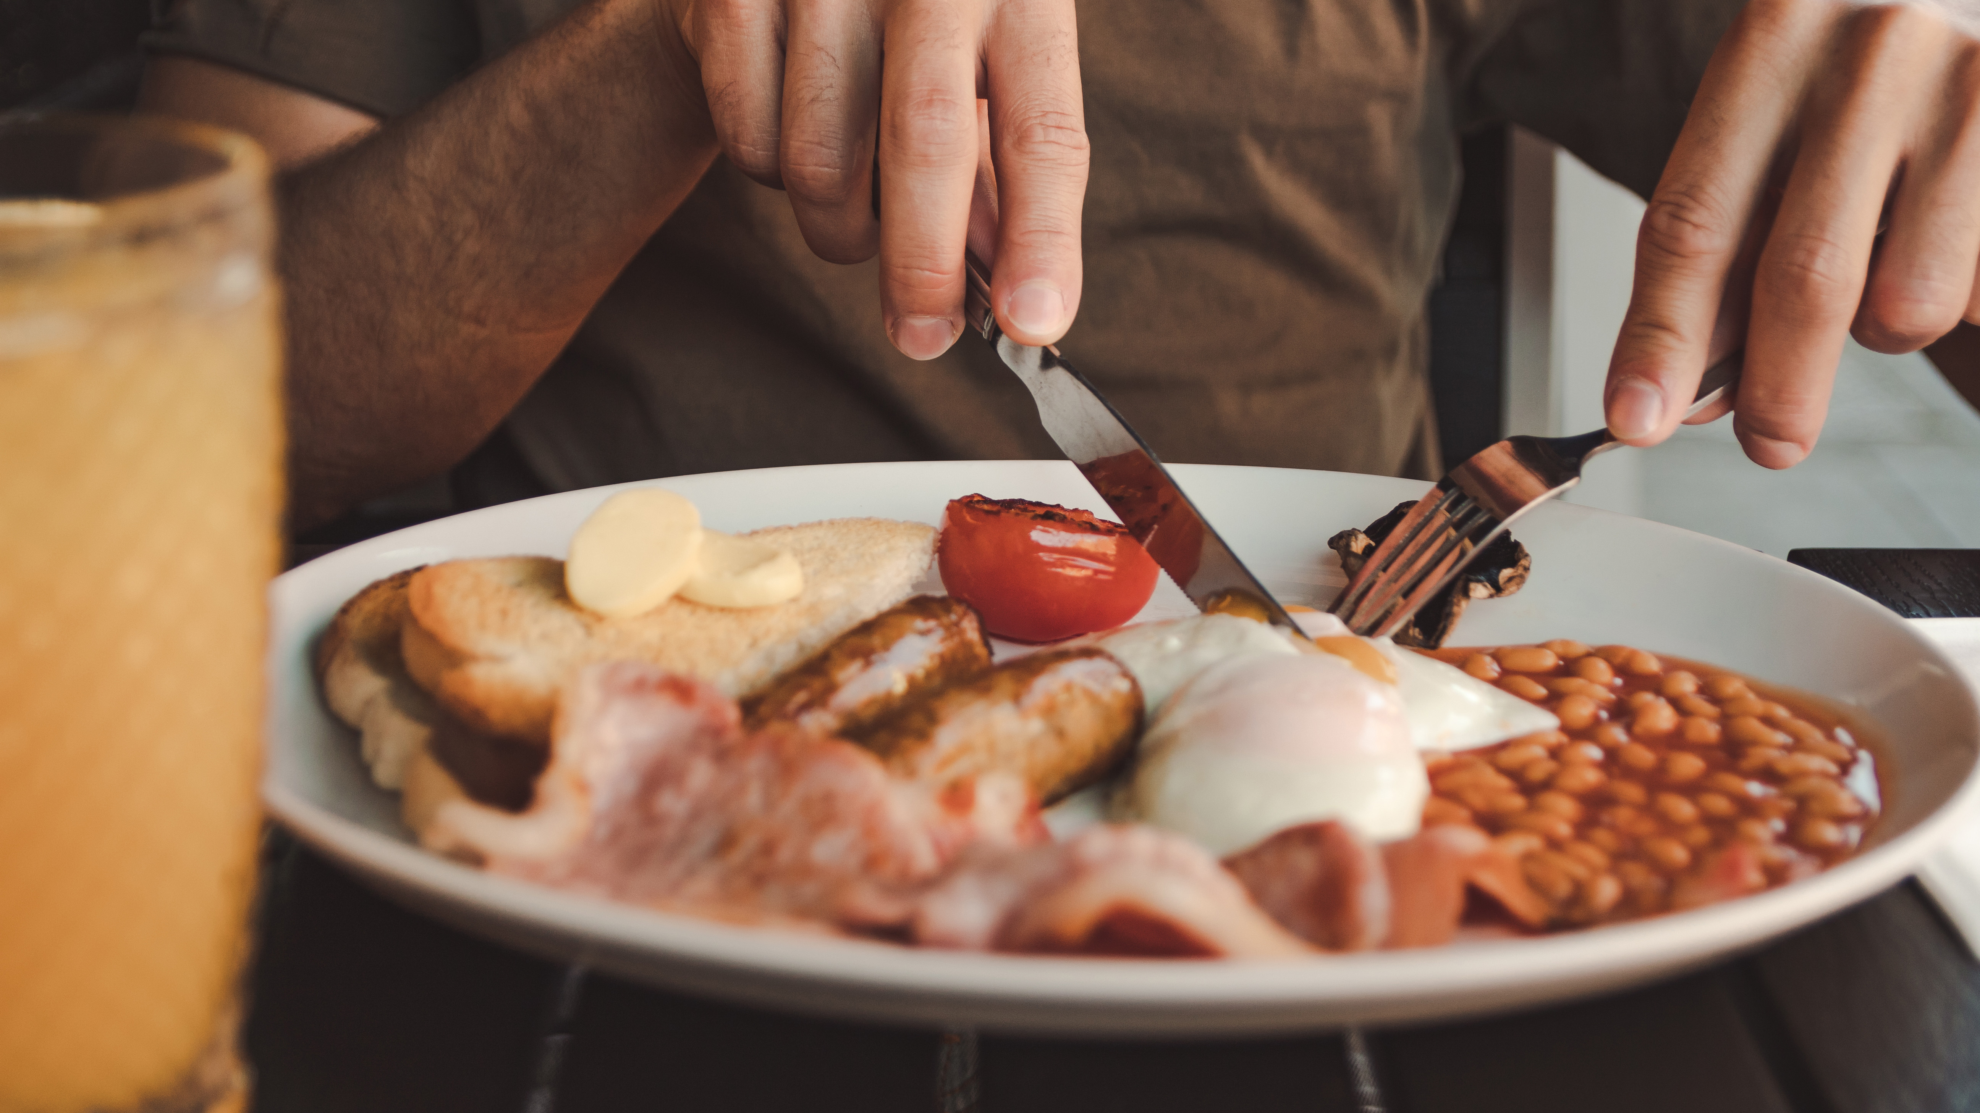 Full English Breakfasts In London